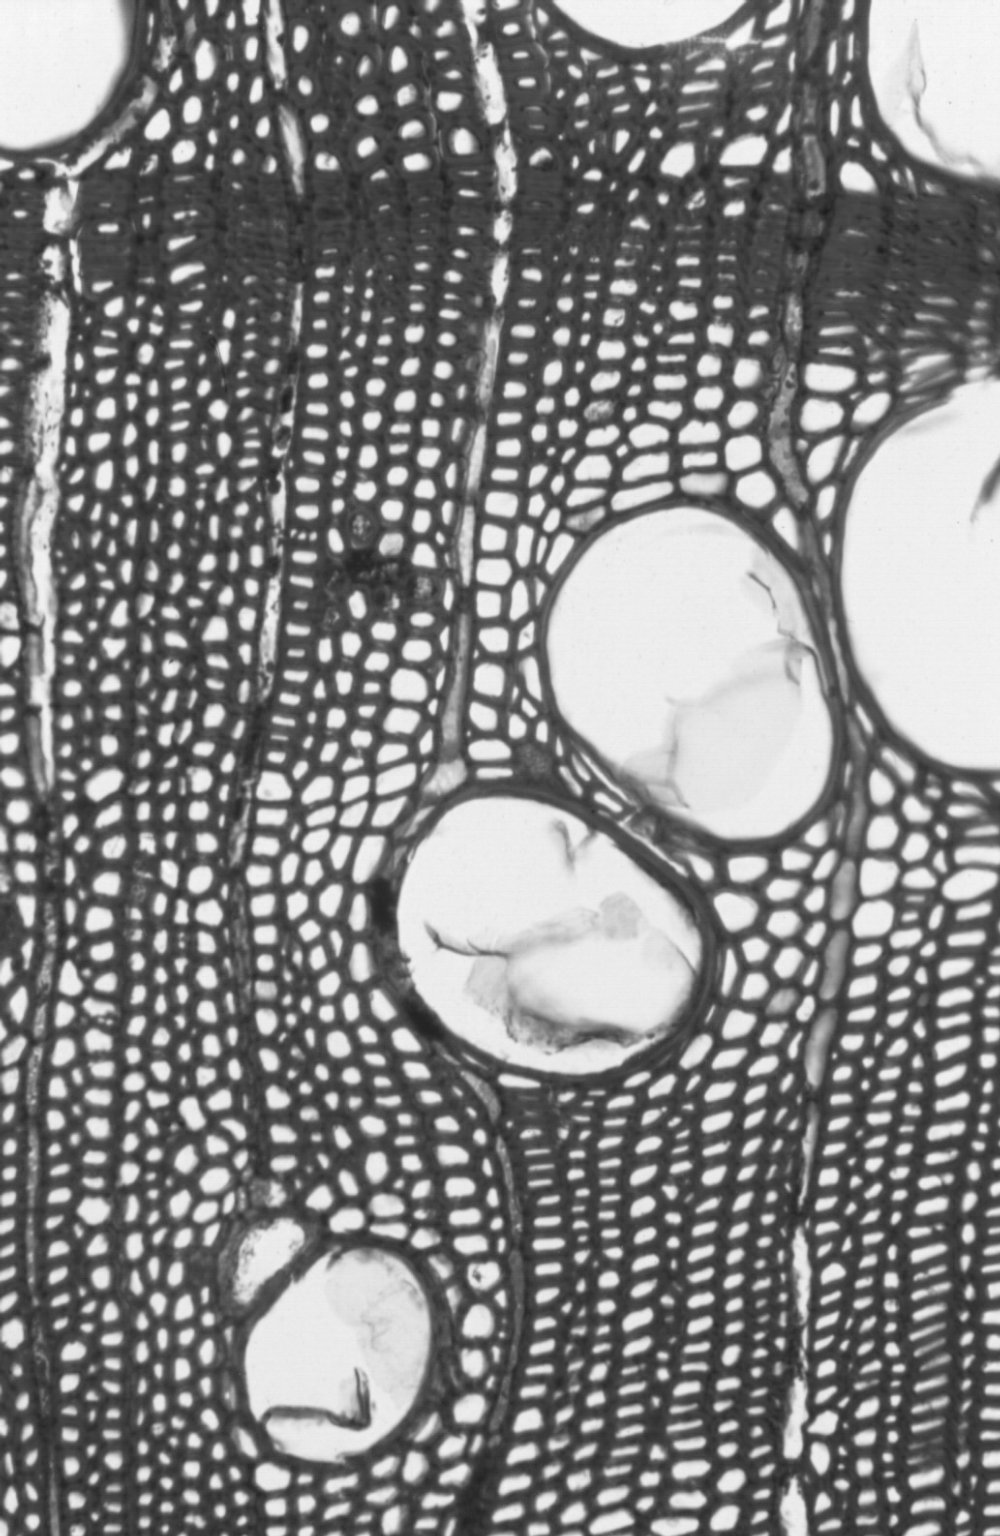 MYRTACEAE Eucalyptus baxteri